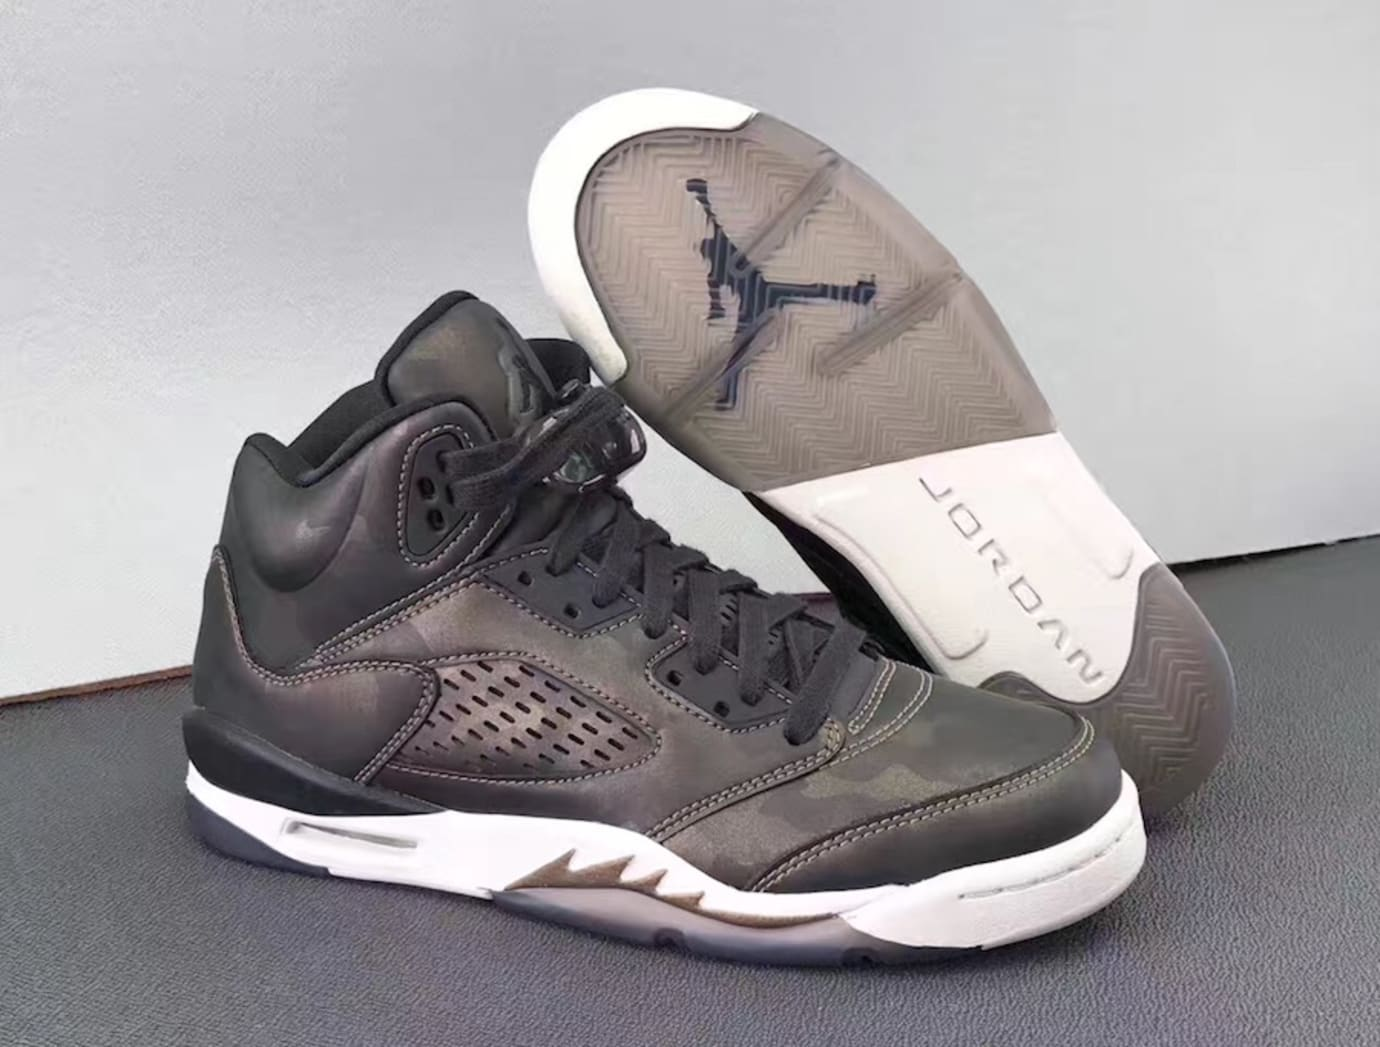 Air Jordan 5 Heiress Camo Release Date Sole 919710-030